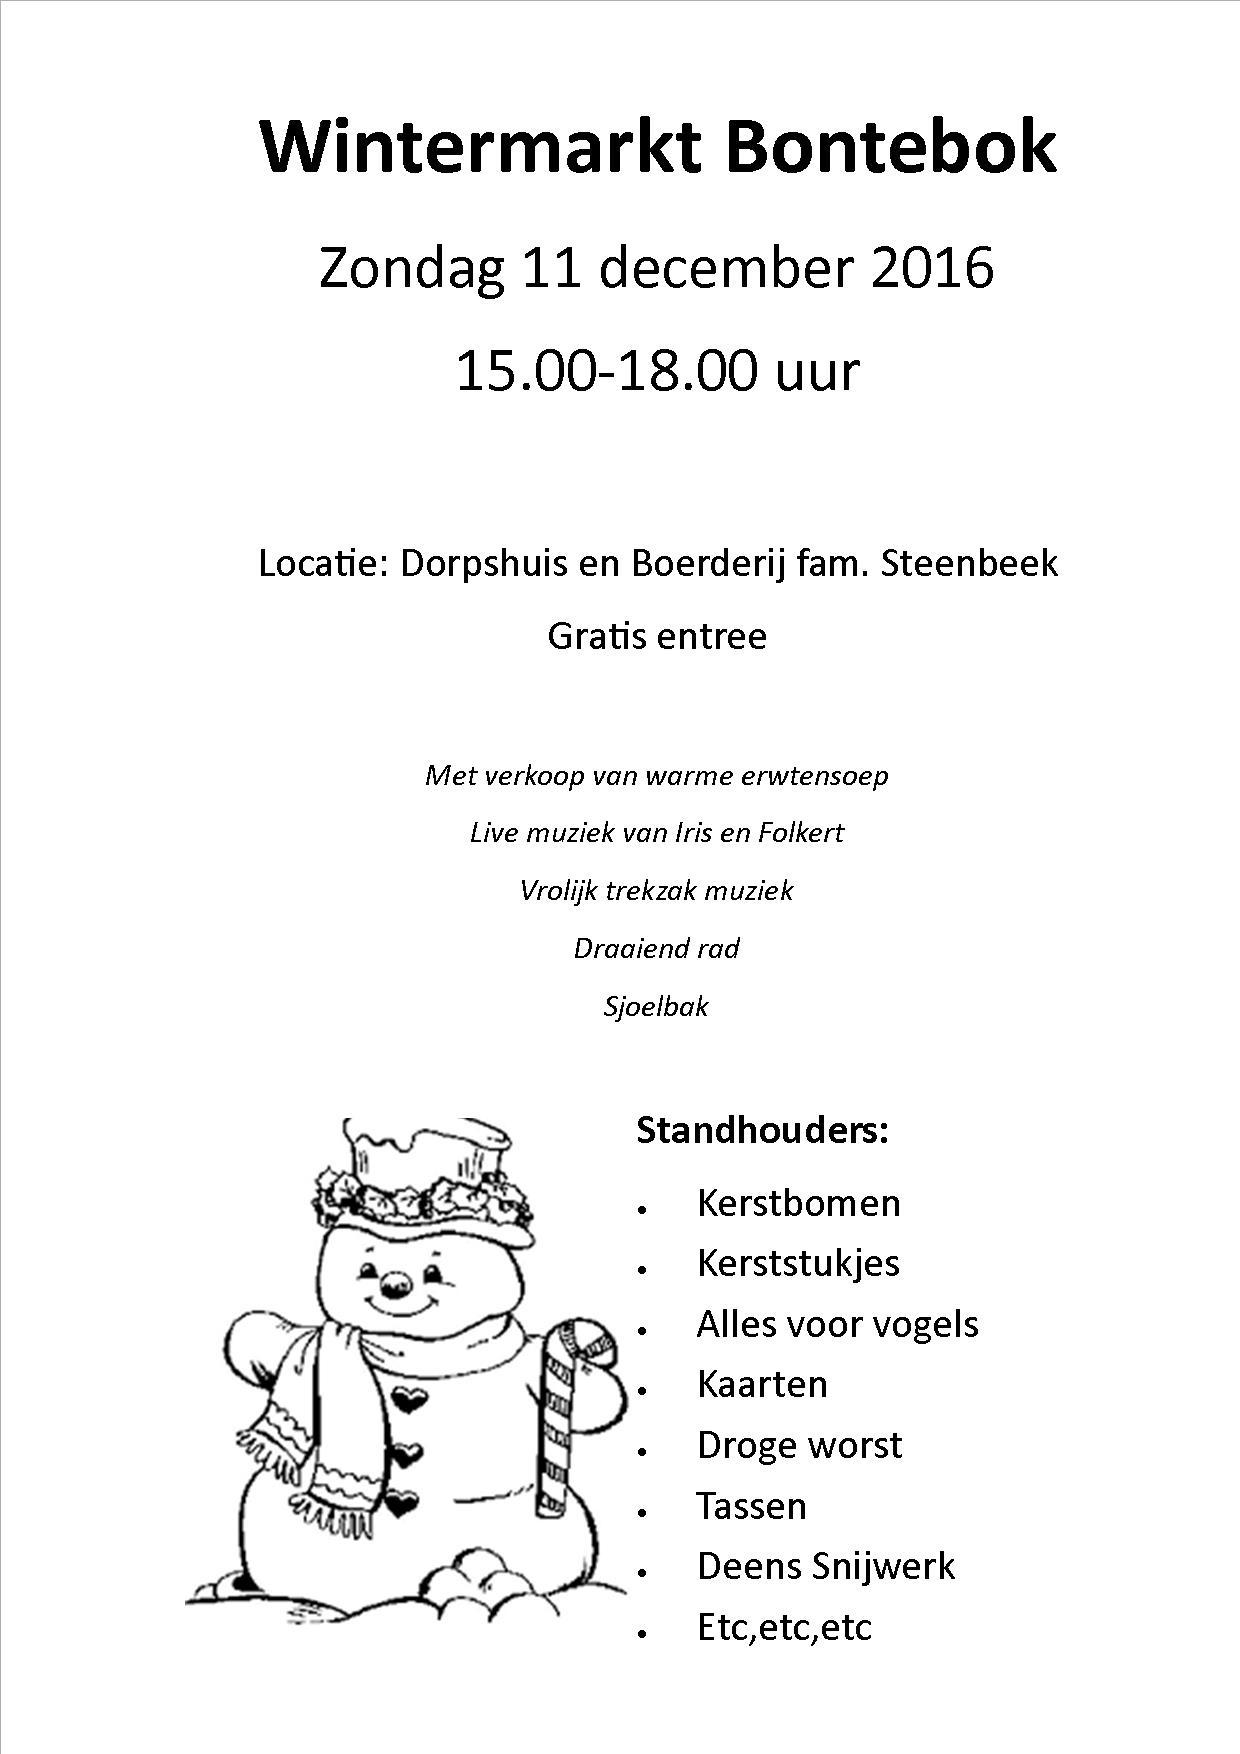 wintermarkt Bontebok 2016